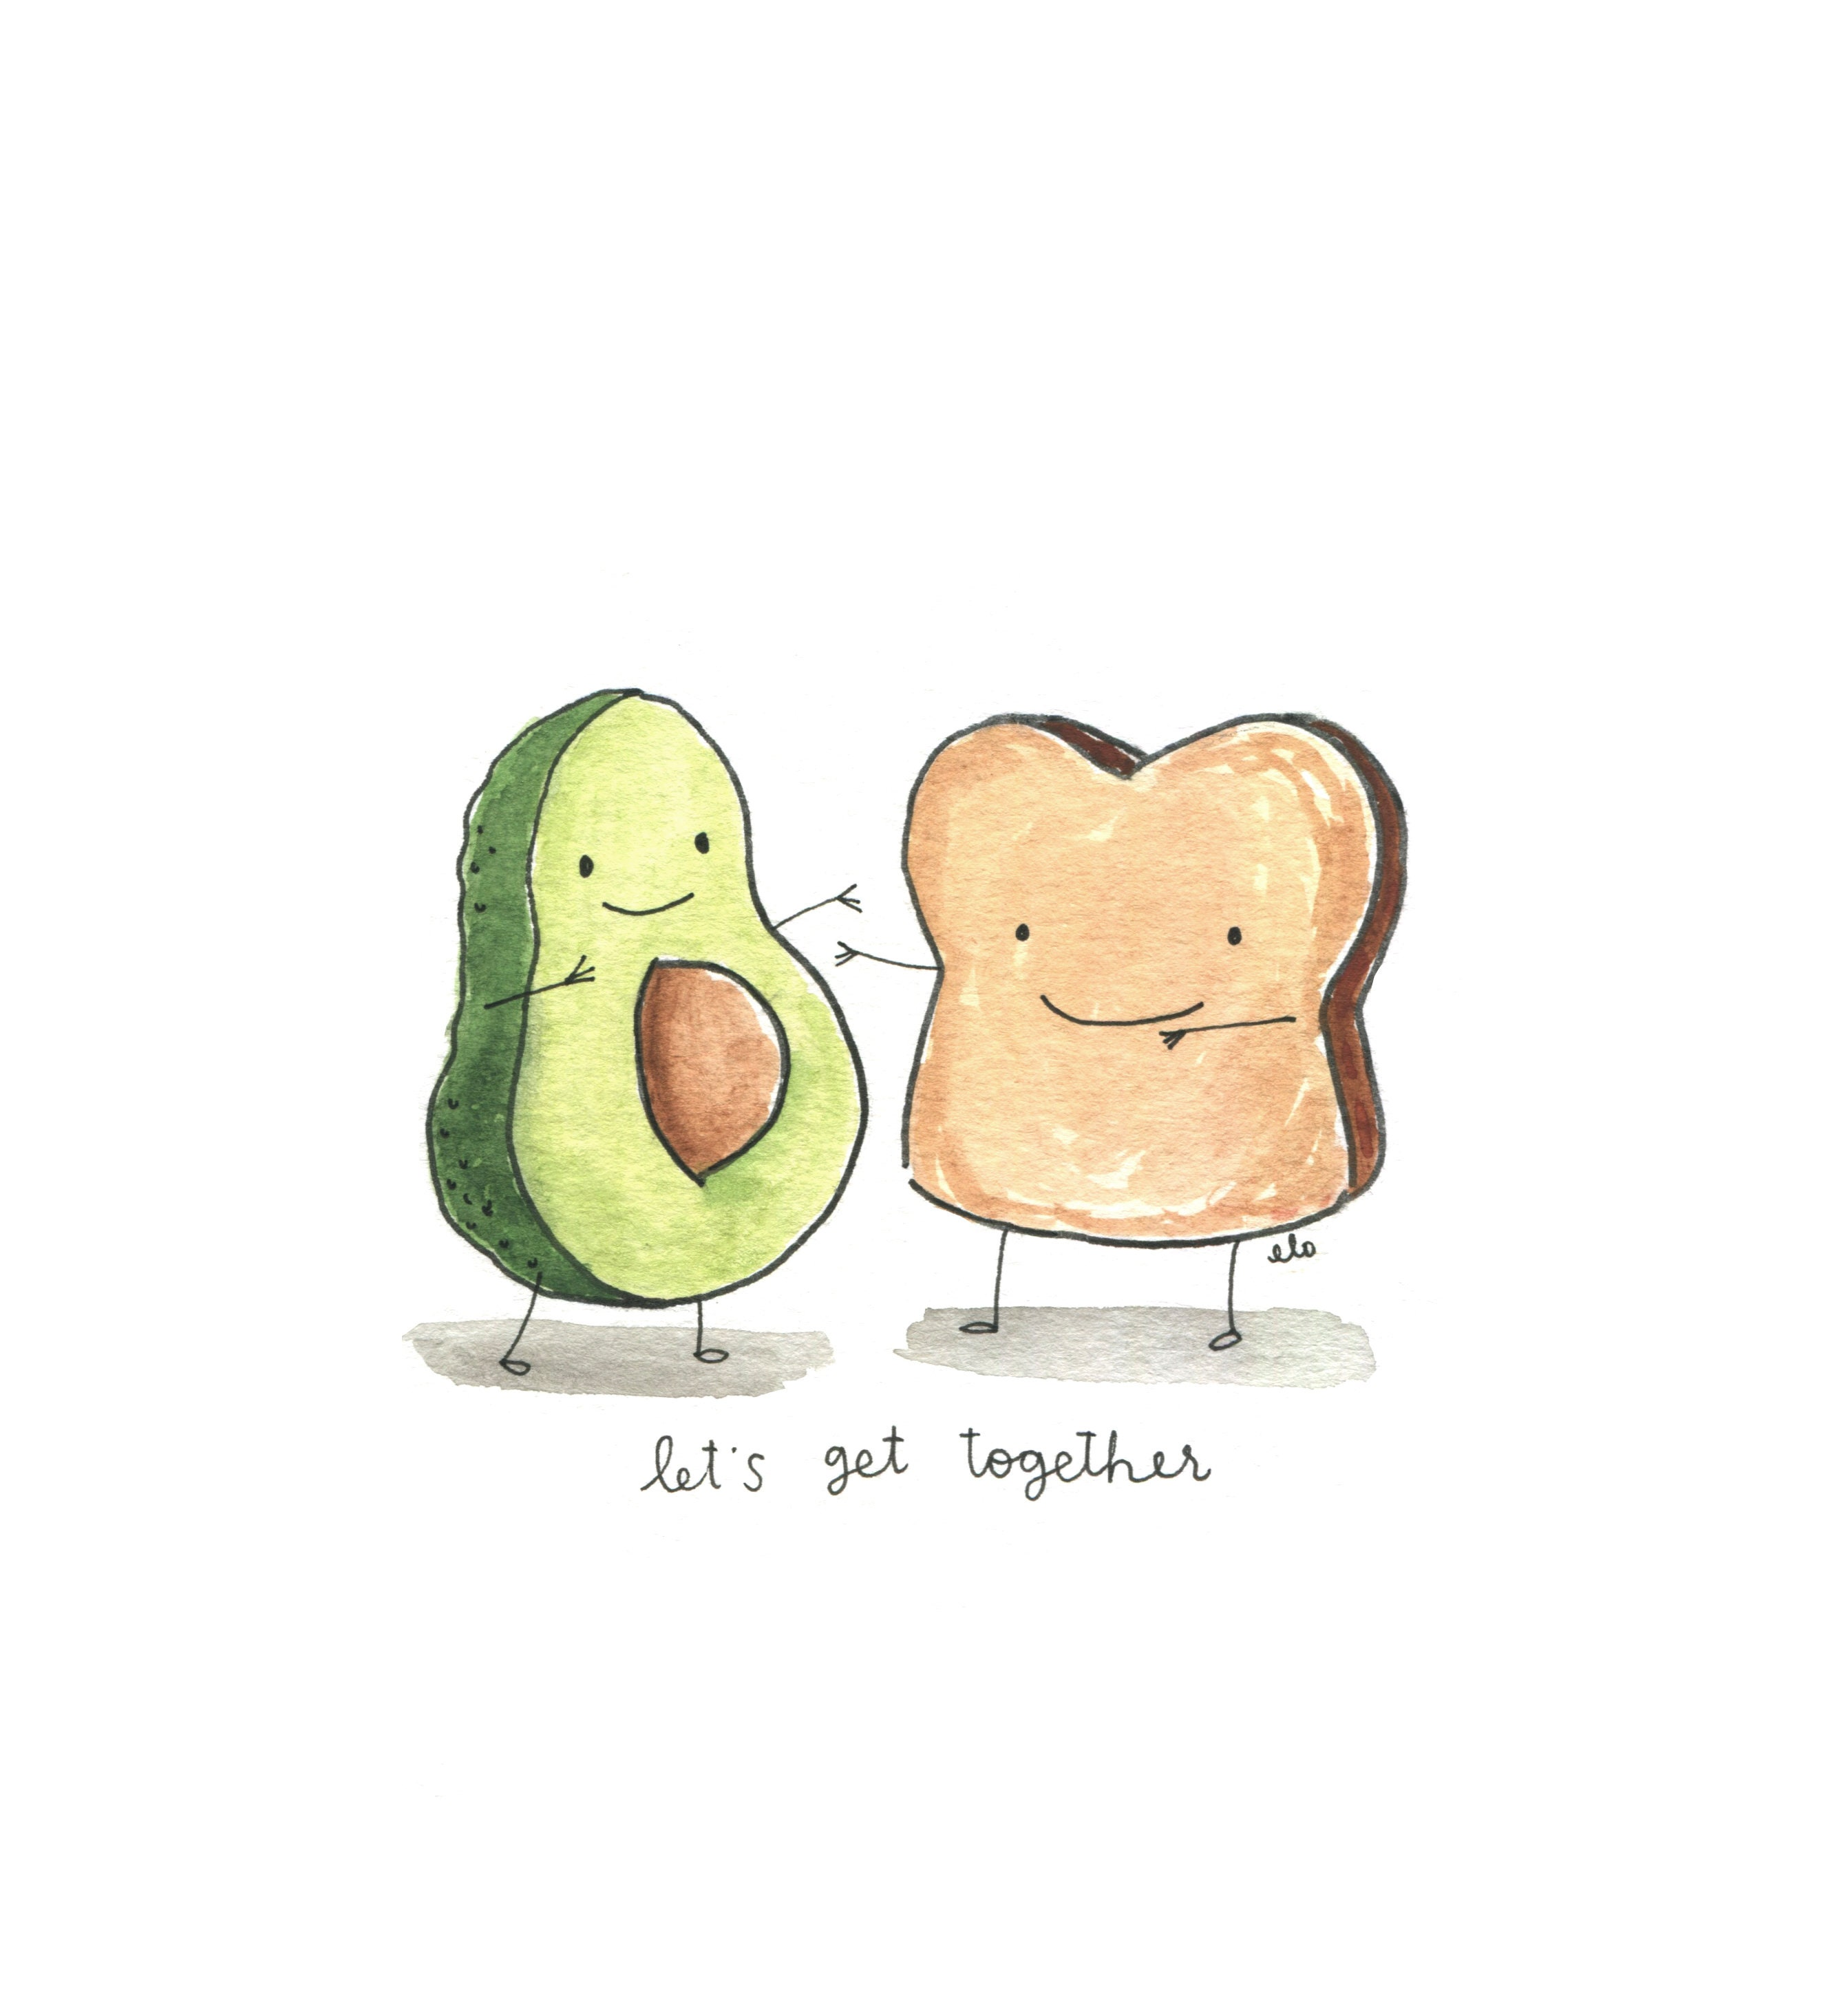 Avocado Toast/Doodle/Art/Cute/Illustration/watercolor/hand | Etsy